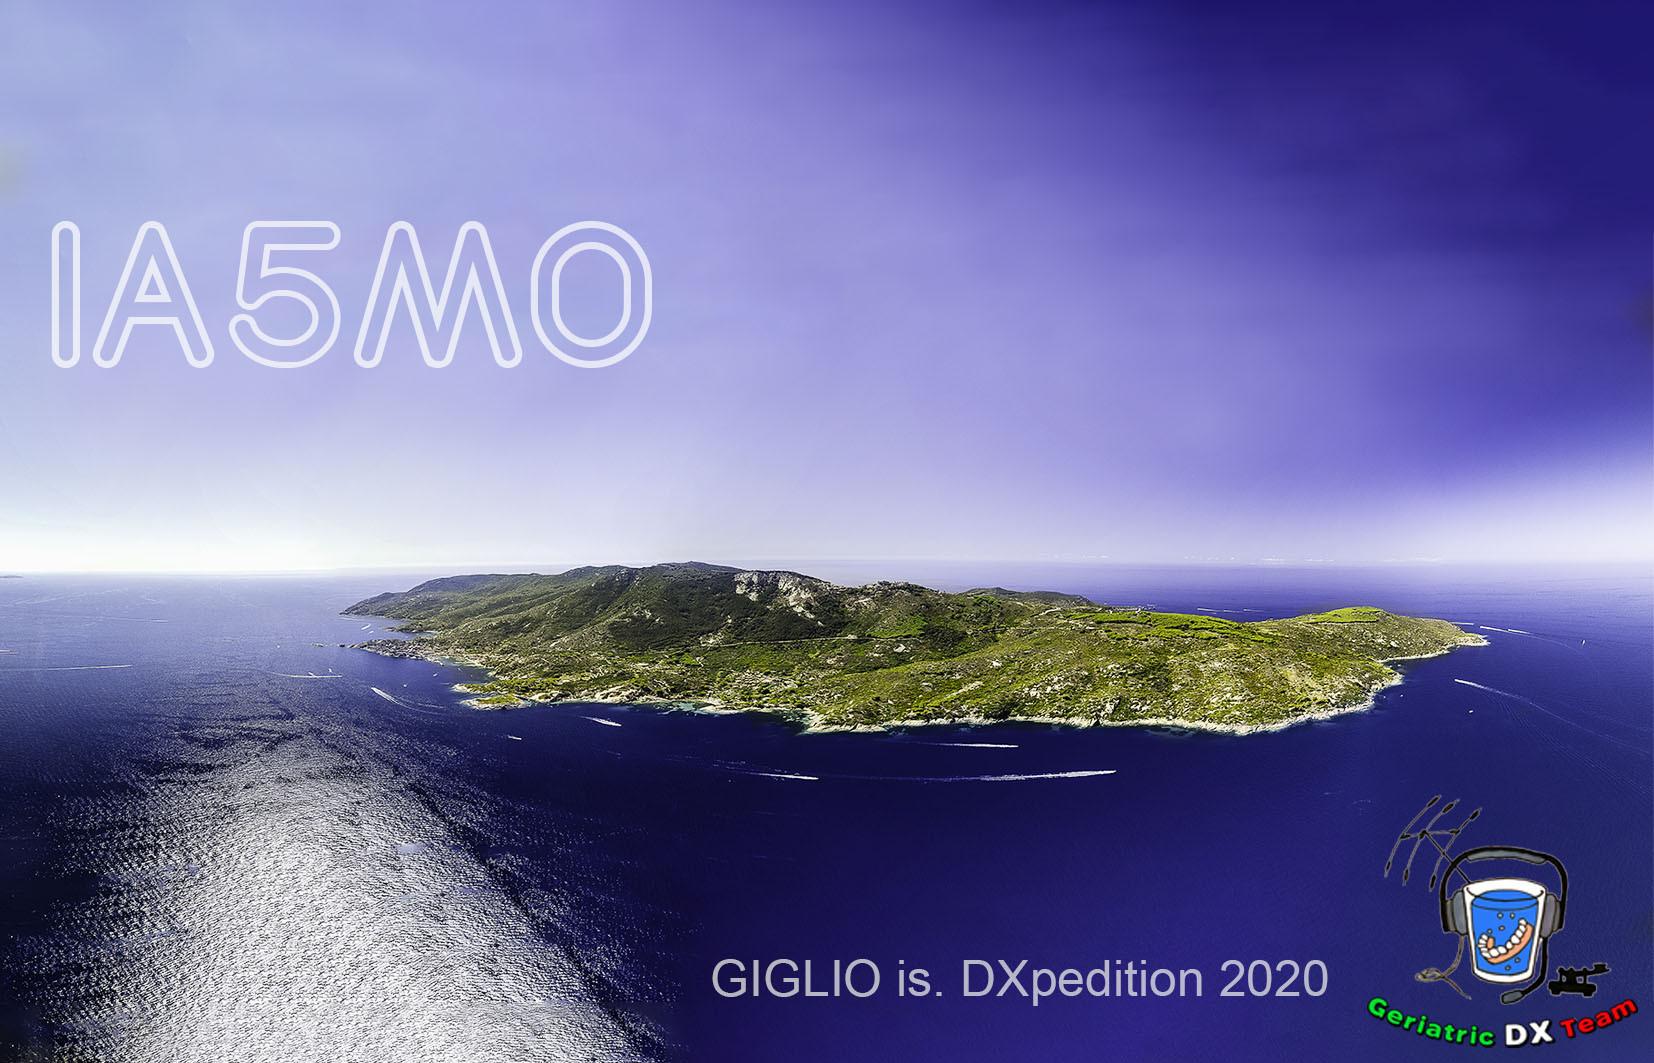 IA5MO Giglio Island QSL Card